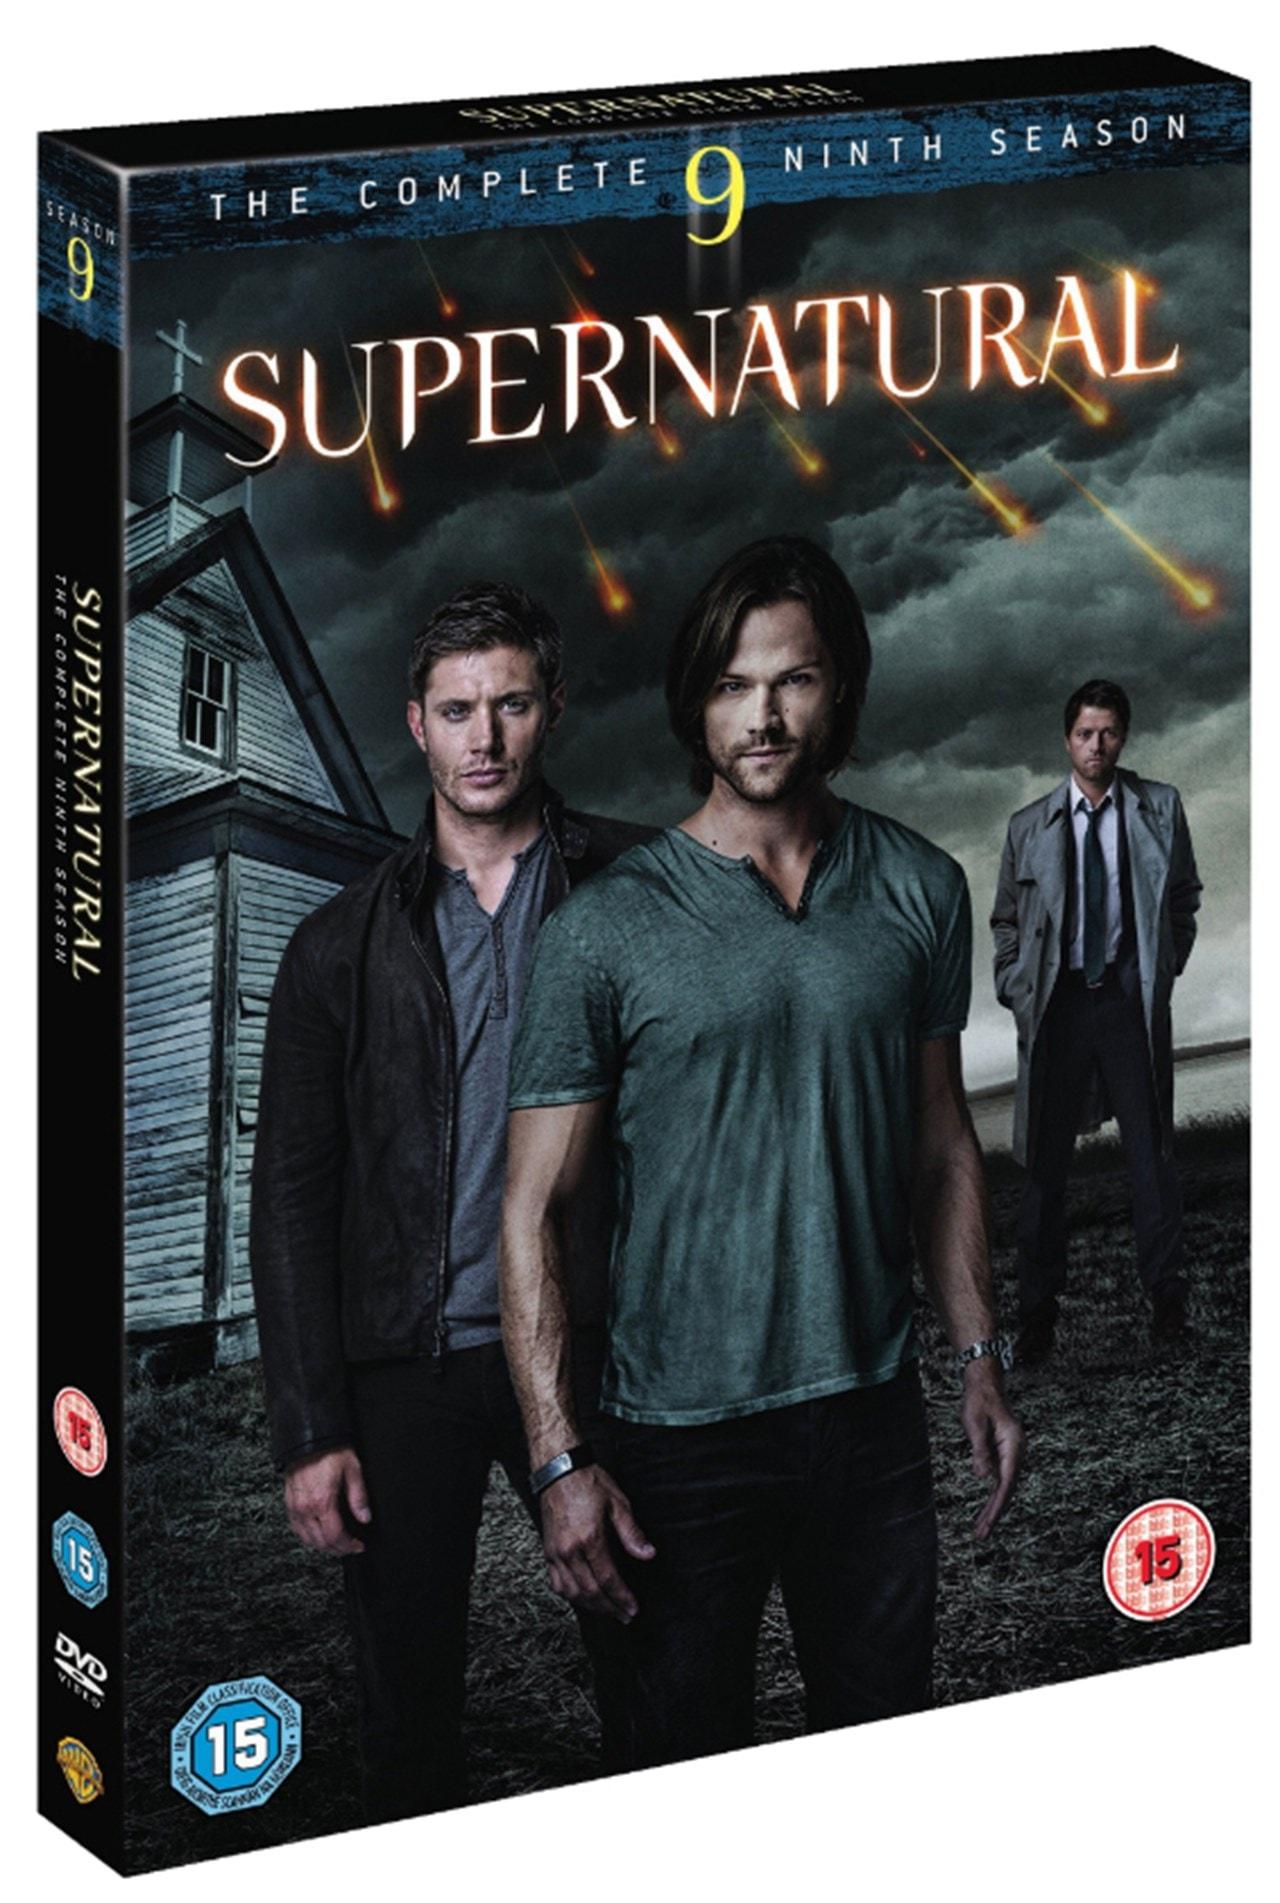 Supernatural: The Complete Ninth Season - 2